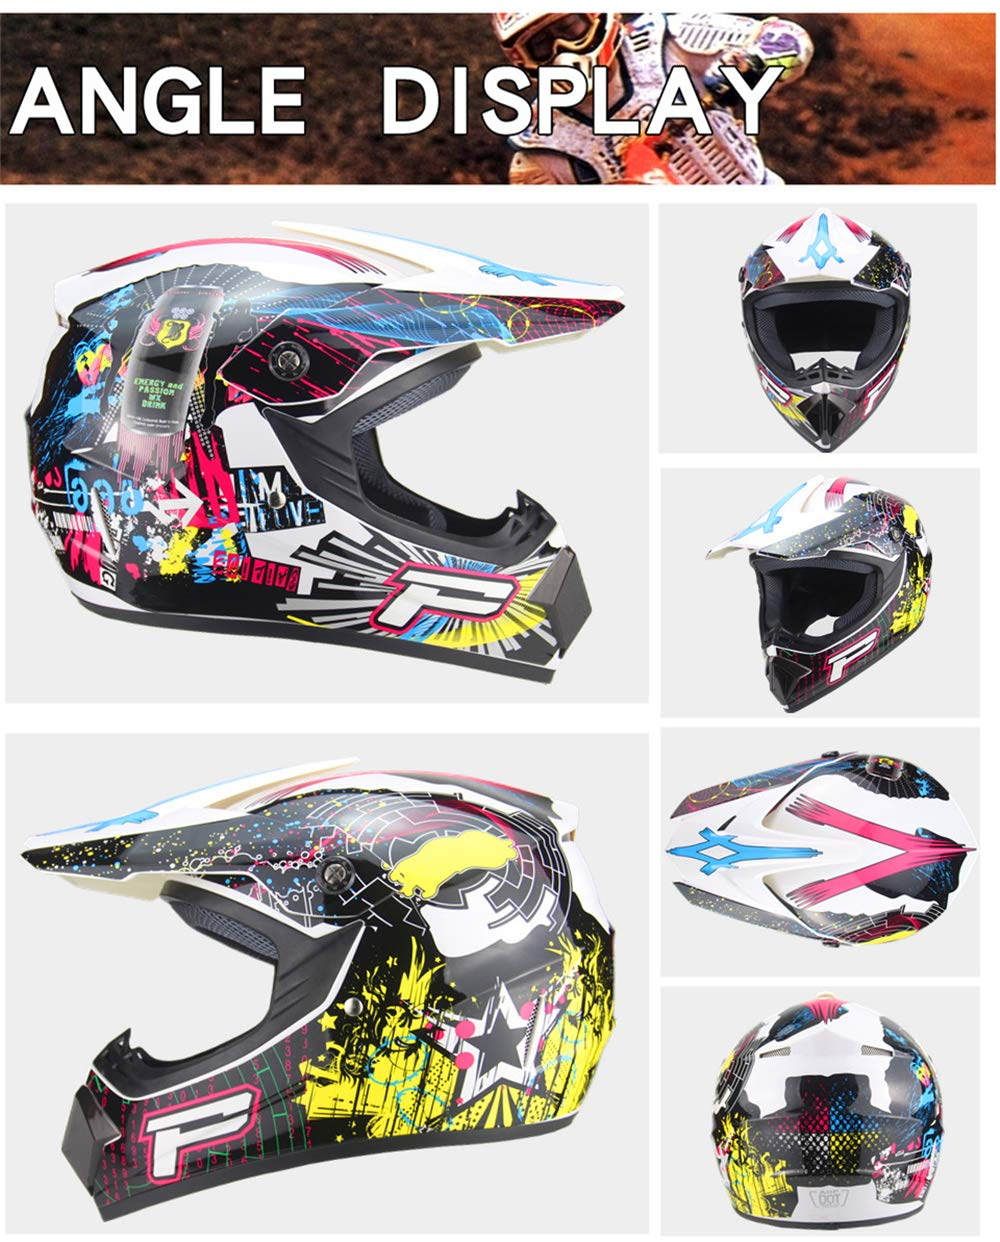 f/ür Erwachsene Jugend Junior Kinder Kinder , Gr/ün S Helm Safe Full Face Classic Fahrrad Mtb Dh Racing Helm Motocross Downhill Fahrradhelm Capacetes Motocross 52~55cm QSWSW Motocross Helm